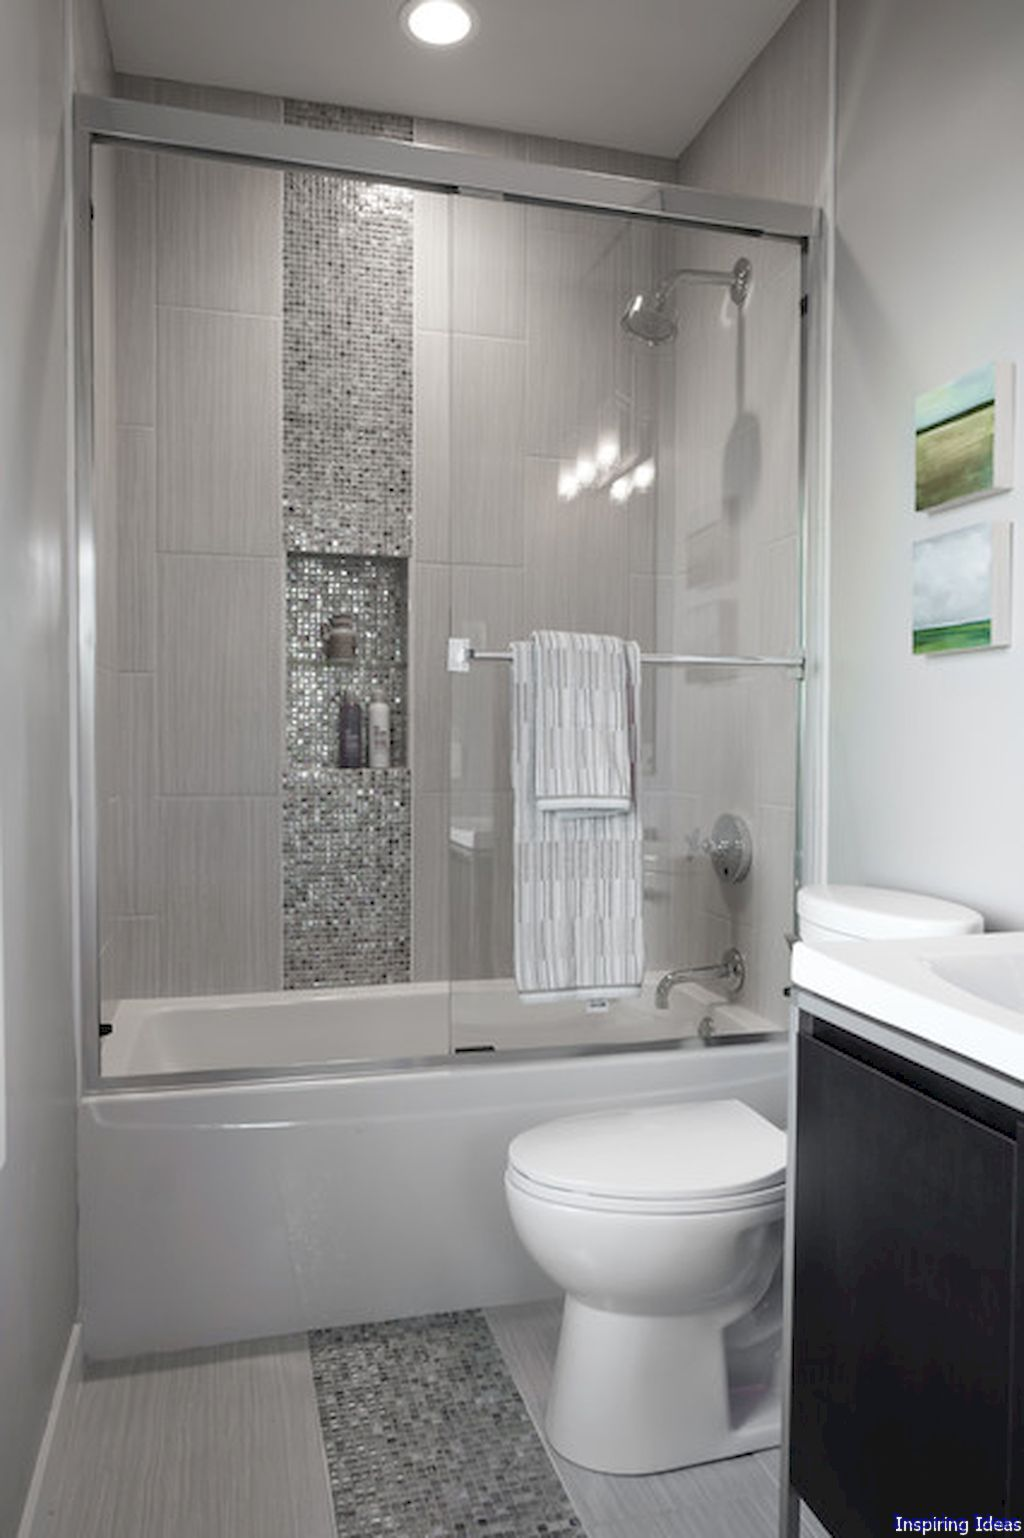 Nice 55 Clever Small Bathroom Design Ideas Httpsdecorisart Simple Clever Small Bathroom Designs Design Inspiration